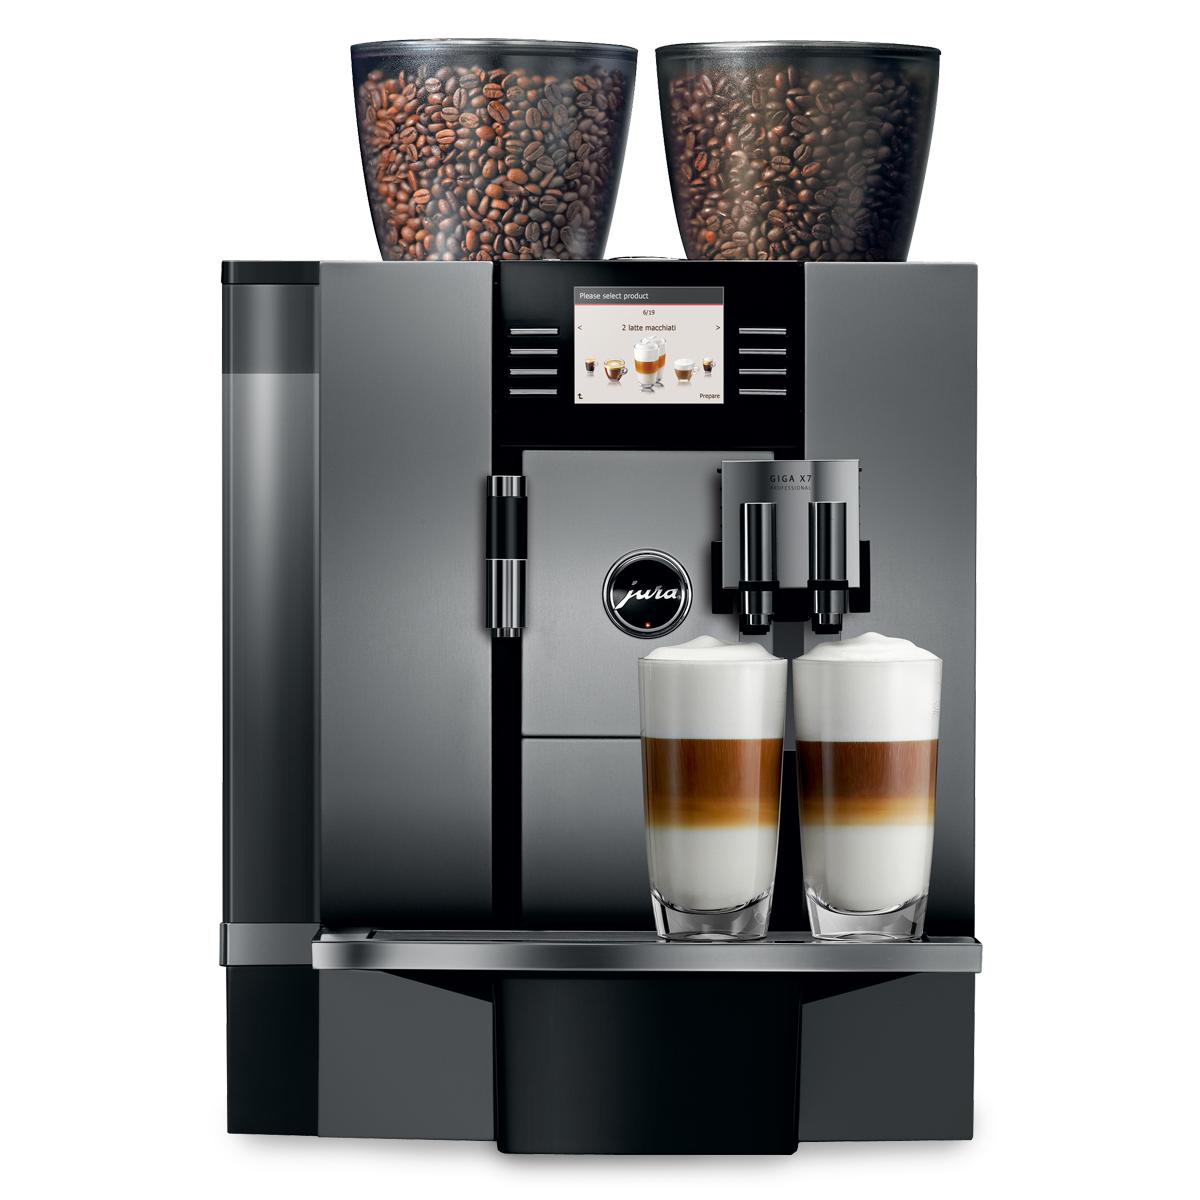 Jura Giga X7 Professional Coffee Machine - Aluminum